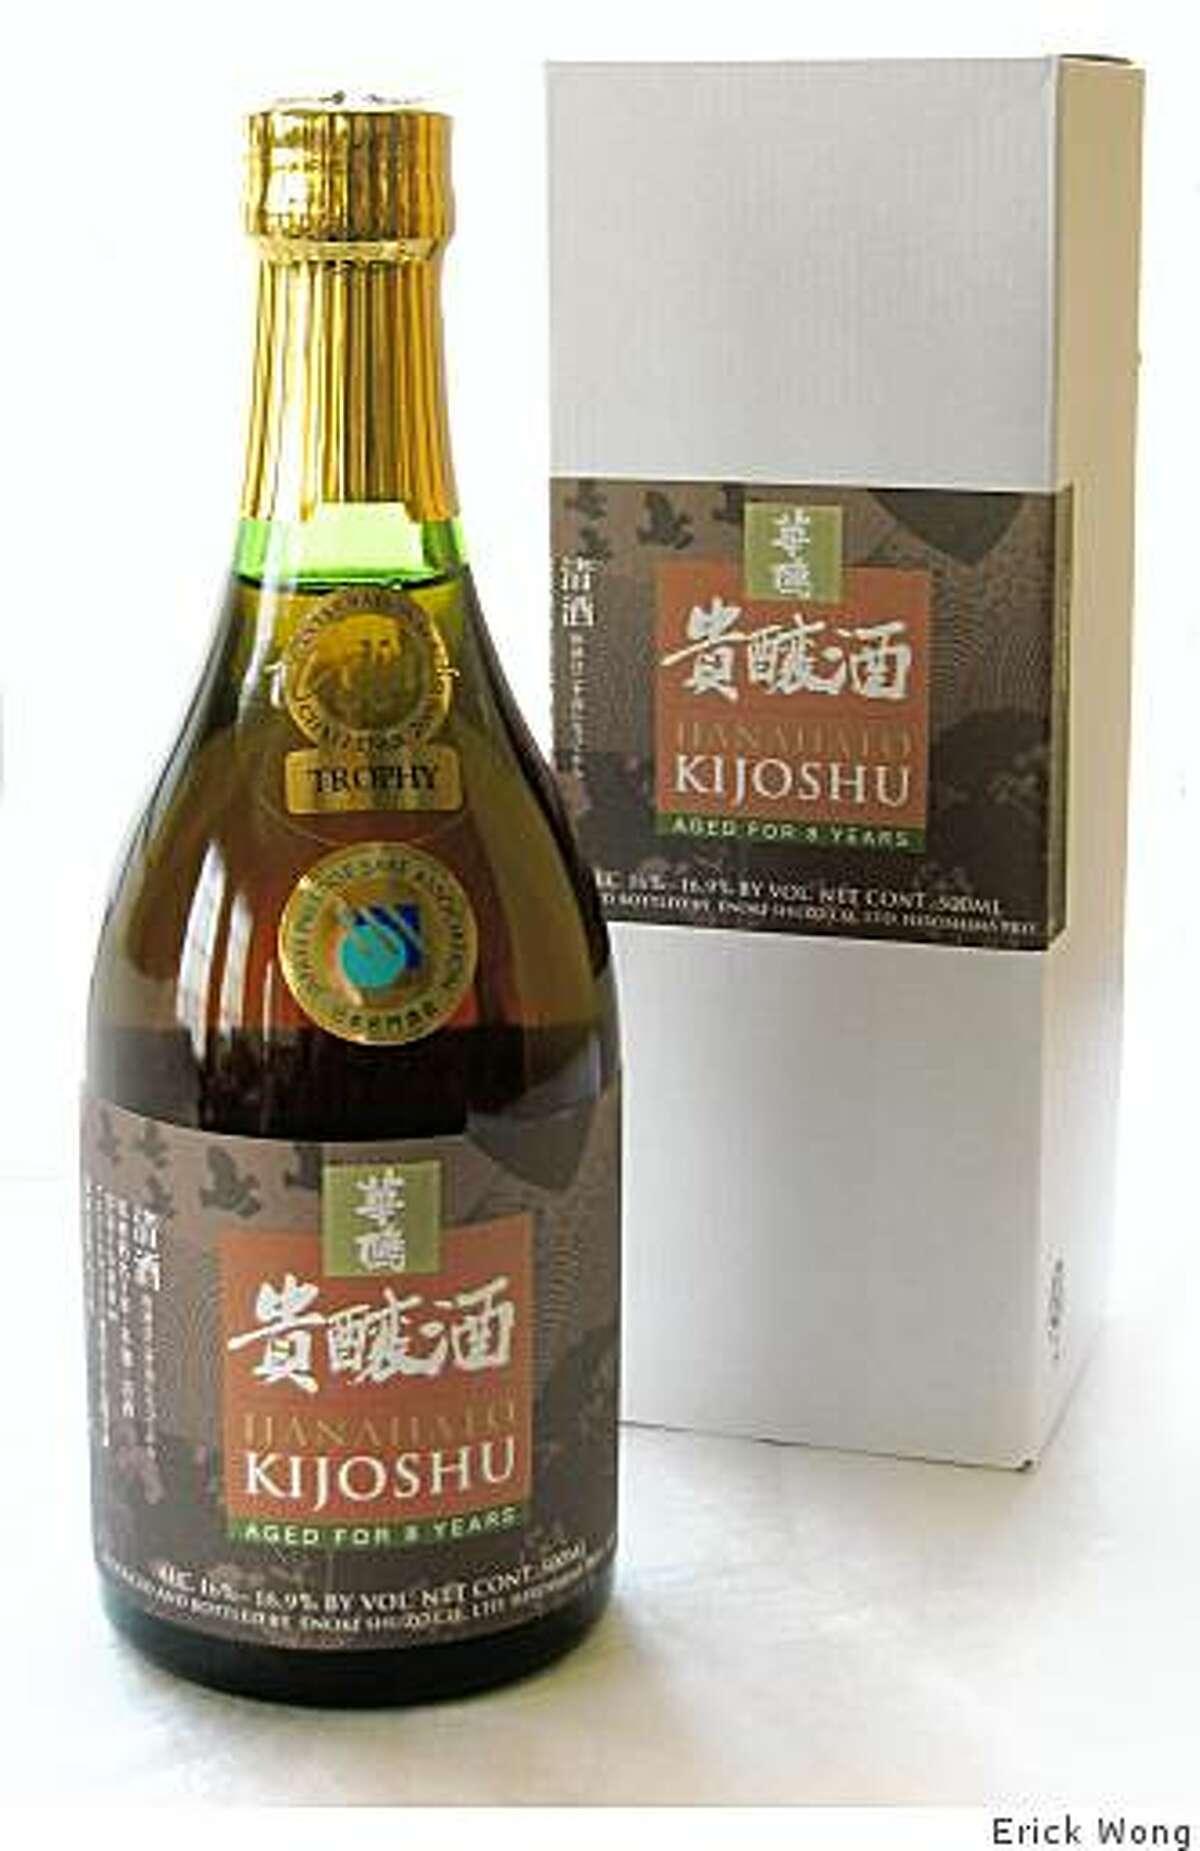 Hanahato Kijoshu sake. Aged for 8 years.